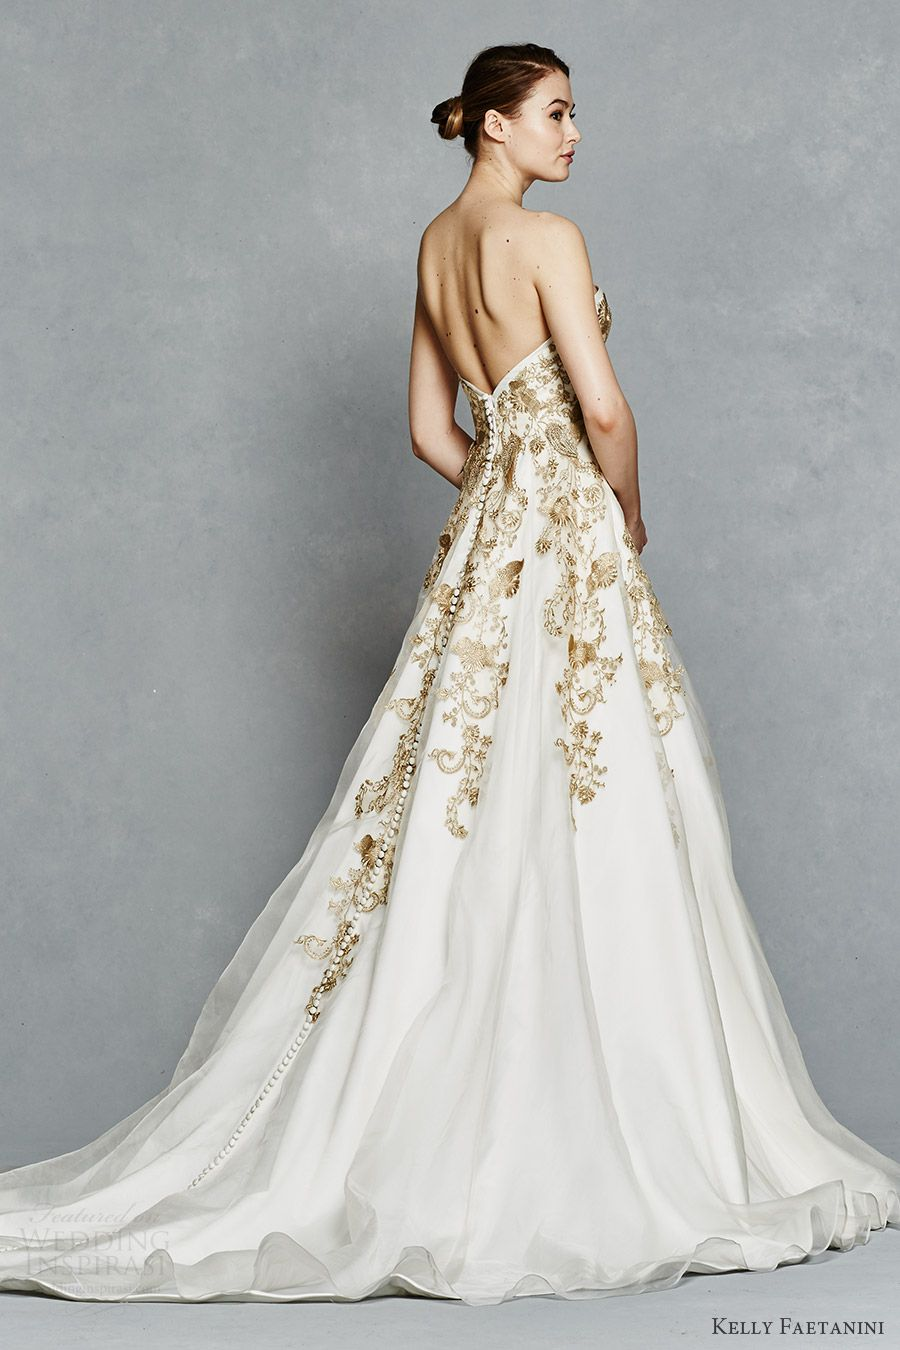 Kelly Faetanini Spring 2017 Wedding Dresses | Embroidery, Wedding ...